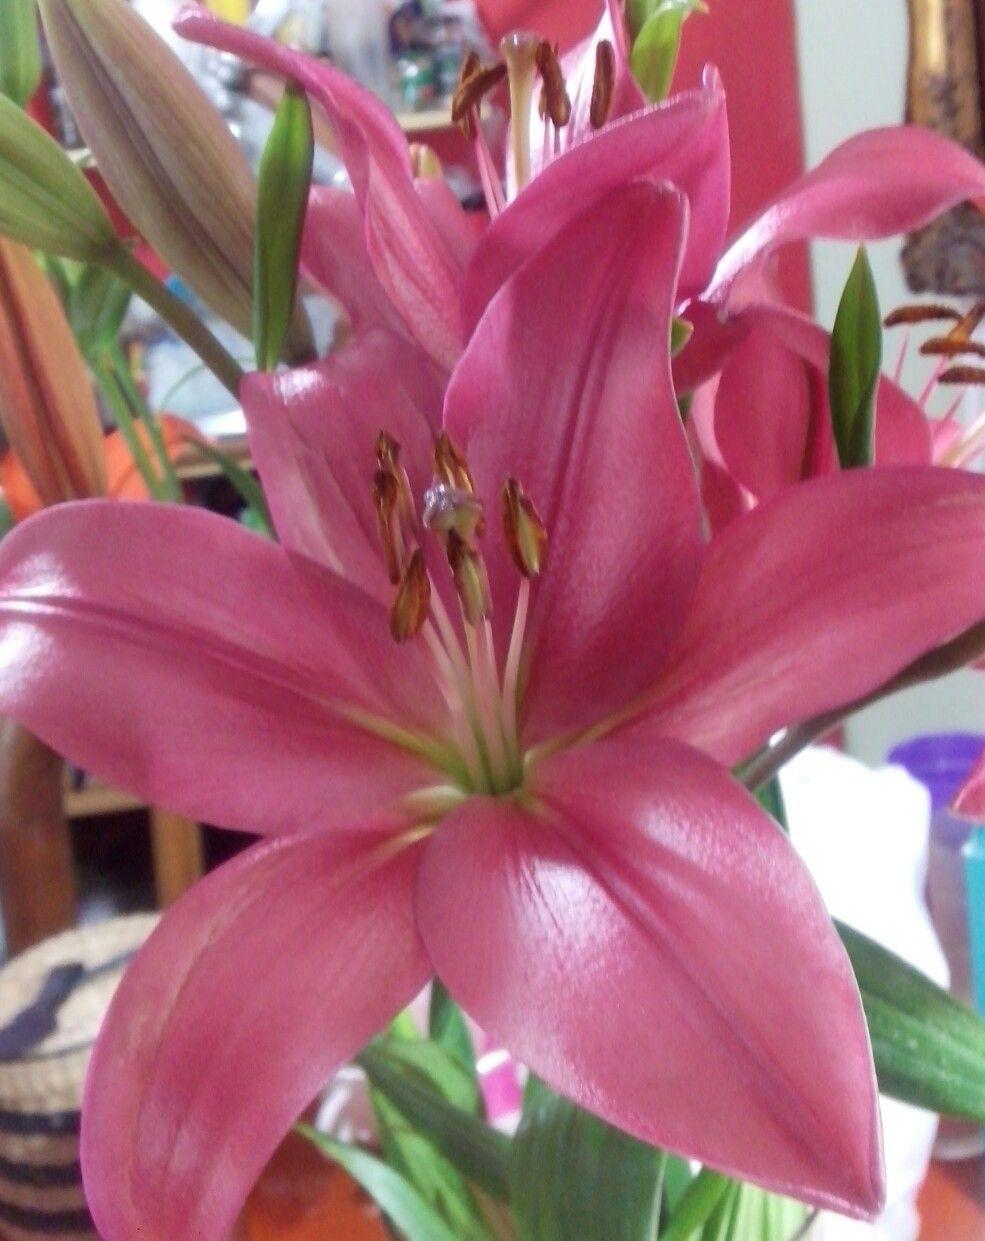 Pin by Valeska Massone on Especial de Flores Pinterest Flowers